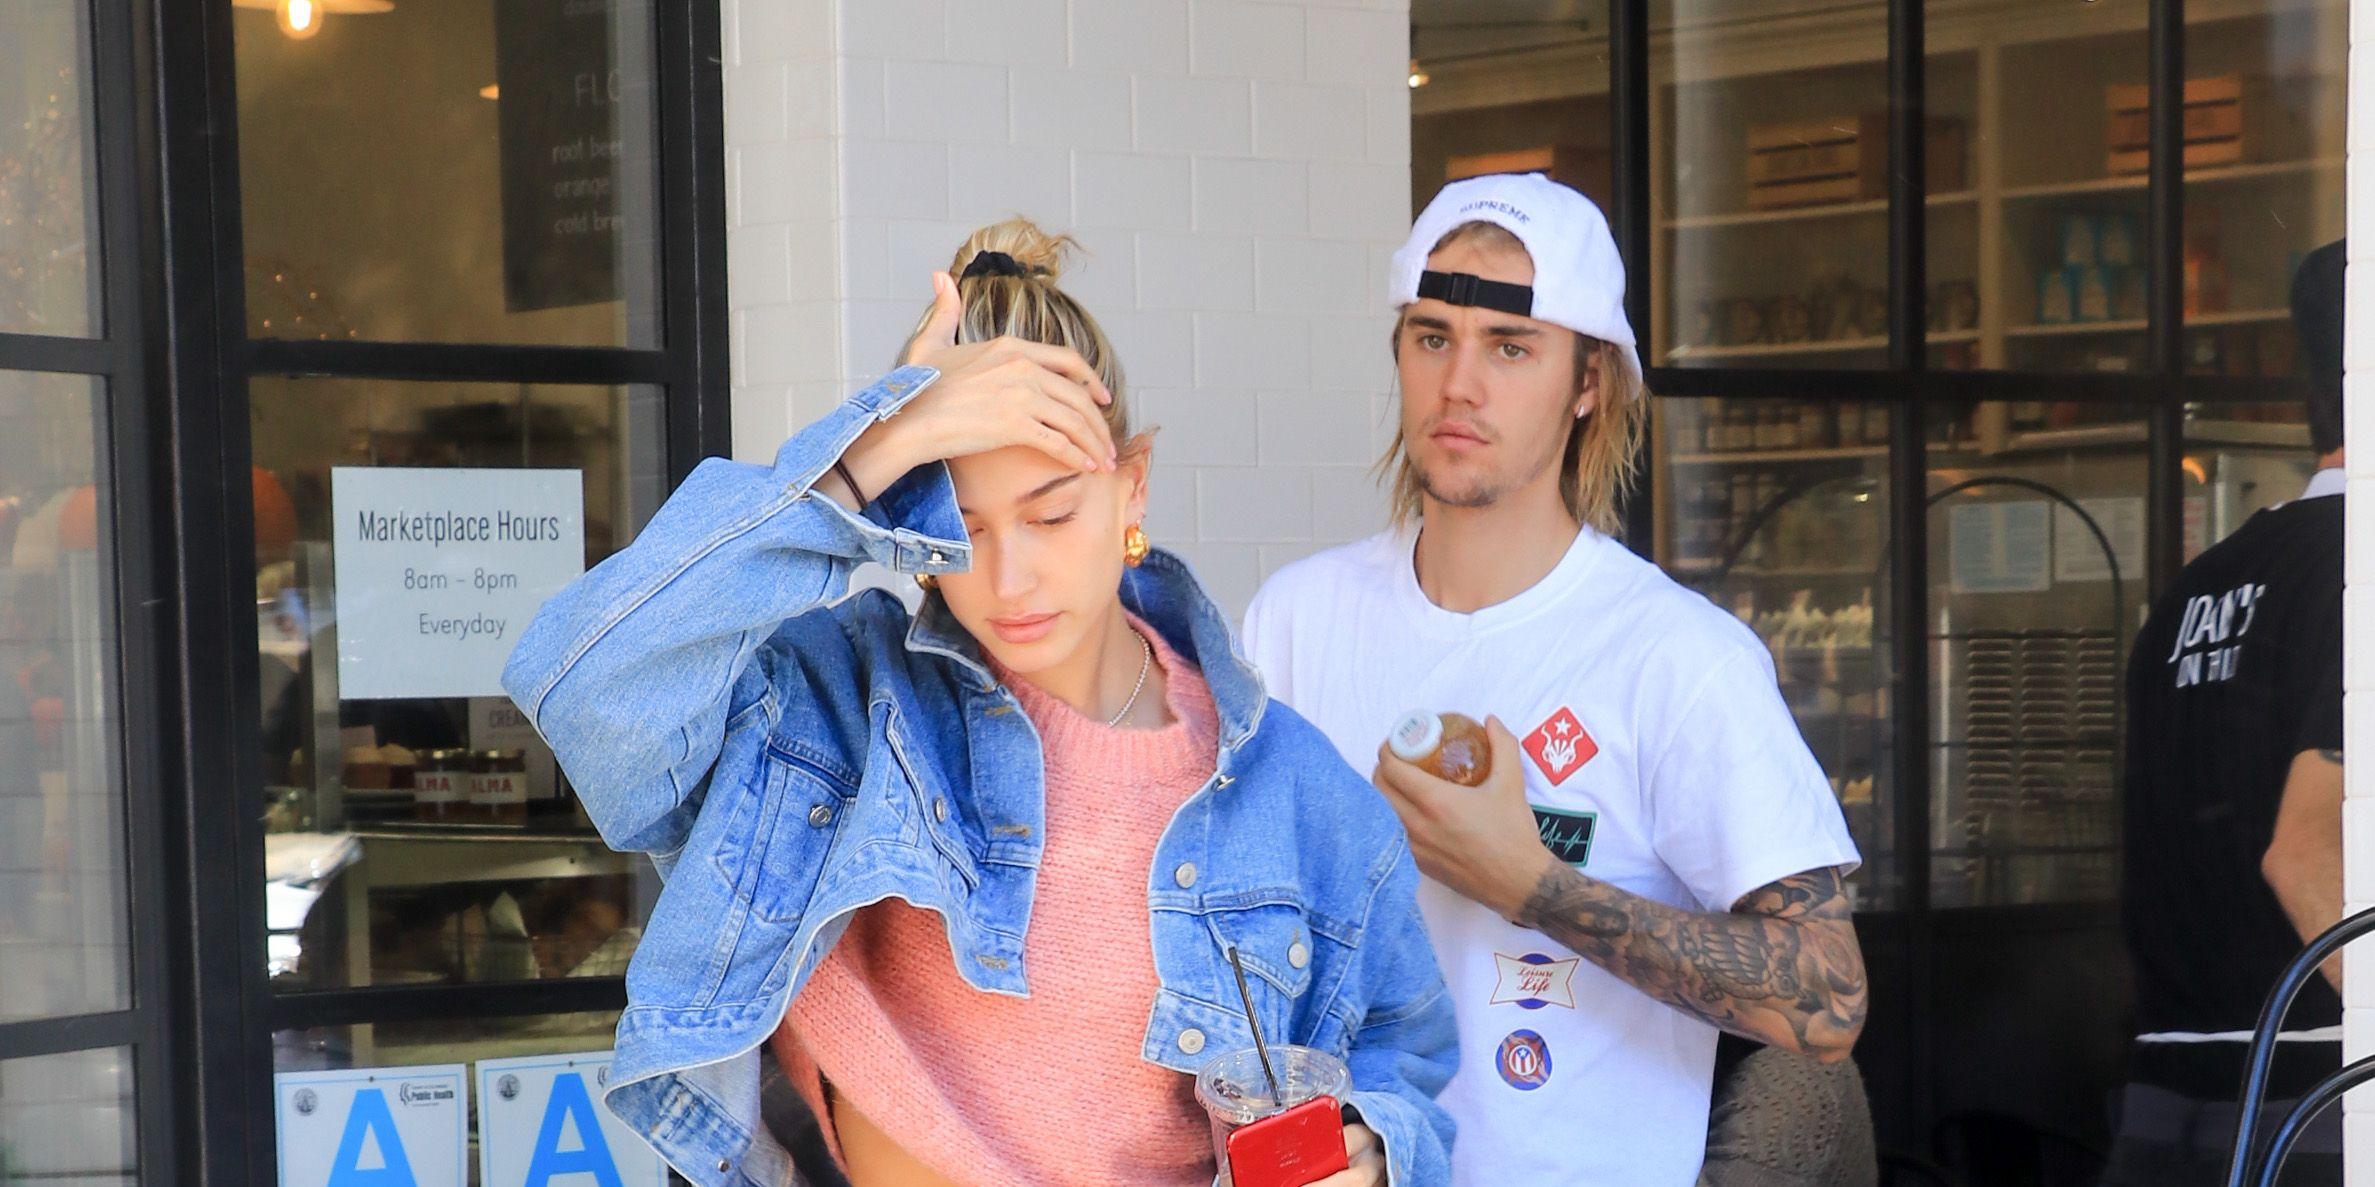 Hailey Baldwin, Justin Bieber, HaileyBieber, handelsmerk, naam vastleggen, modelijn, kledinglijn